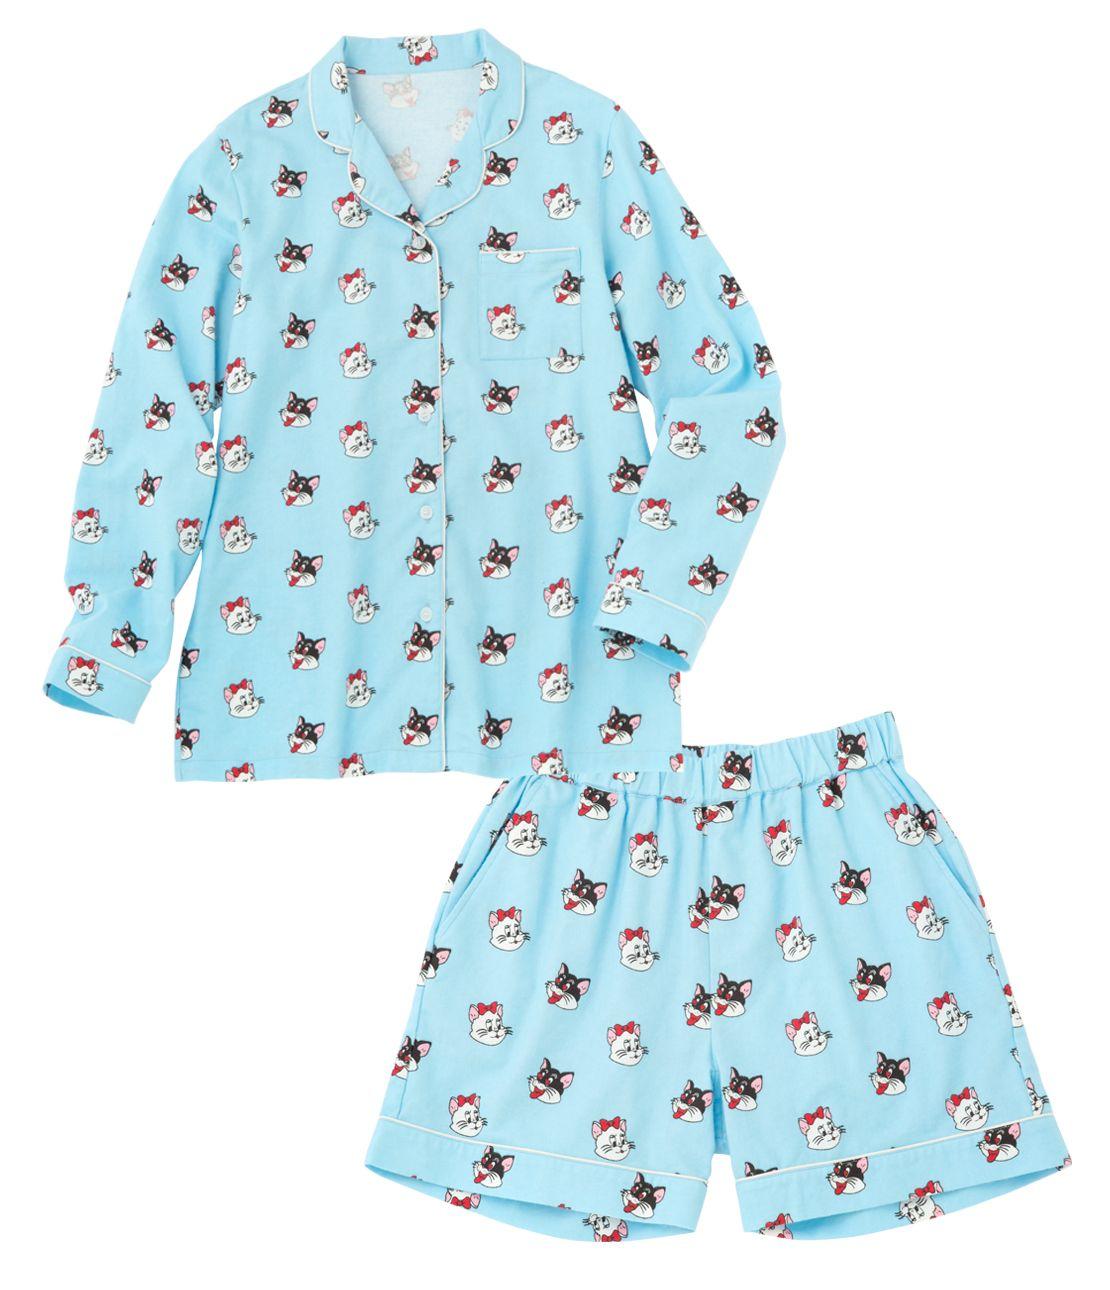 YM flannel print pajamas